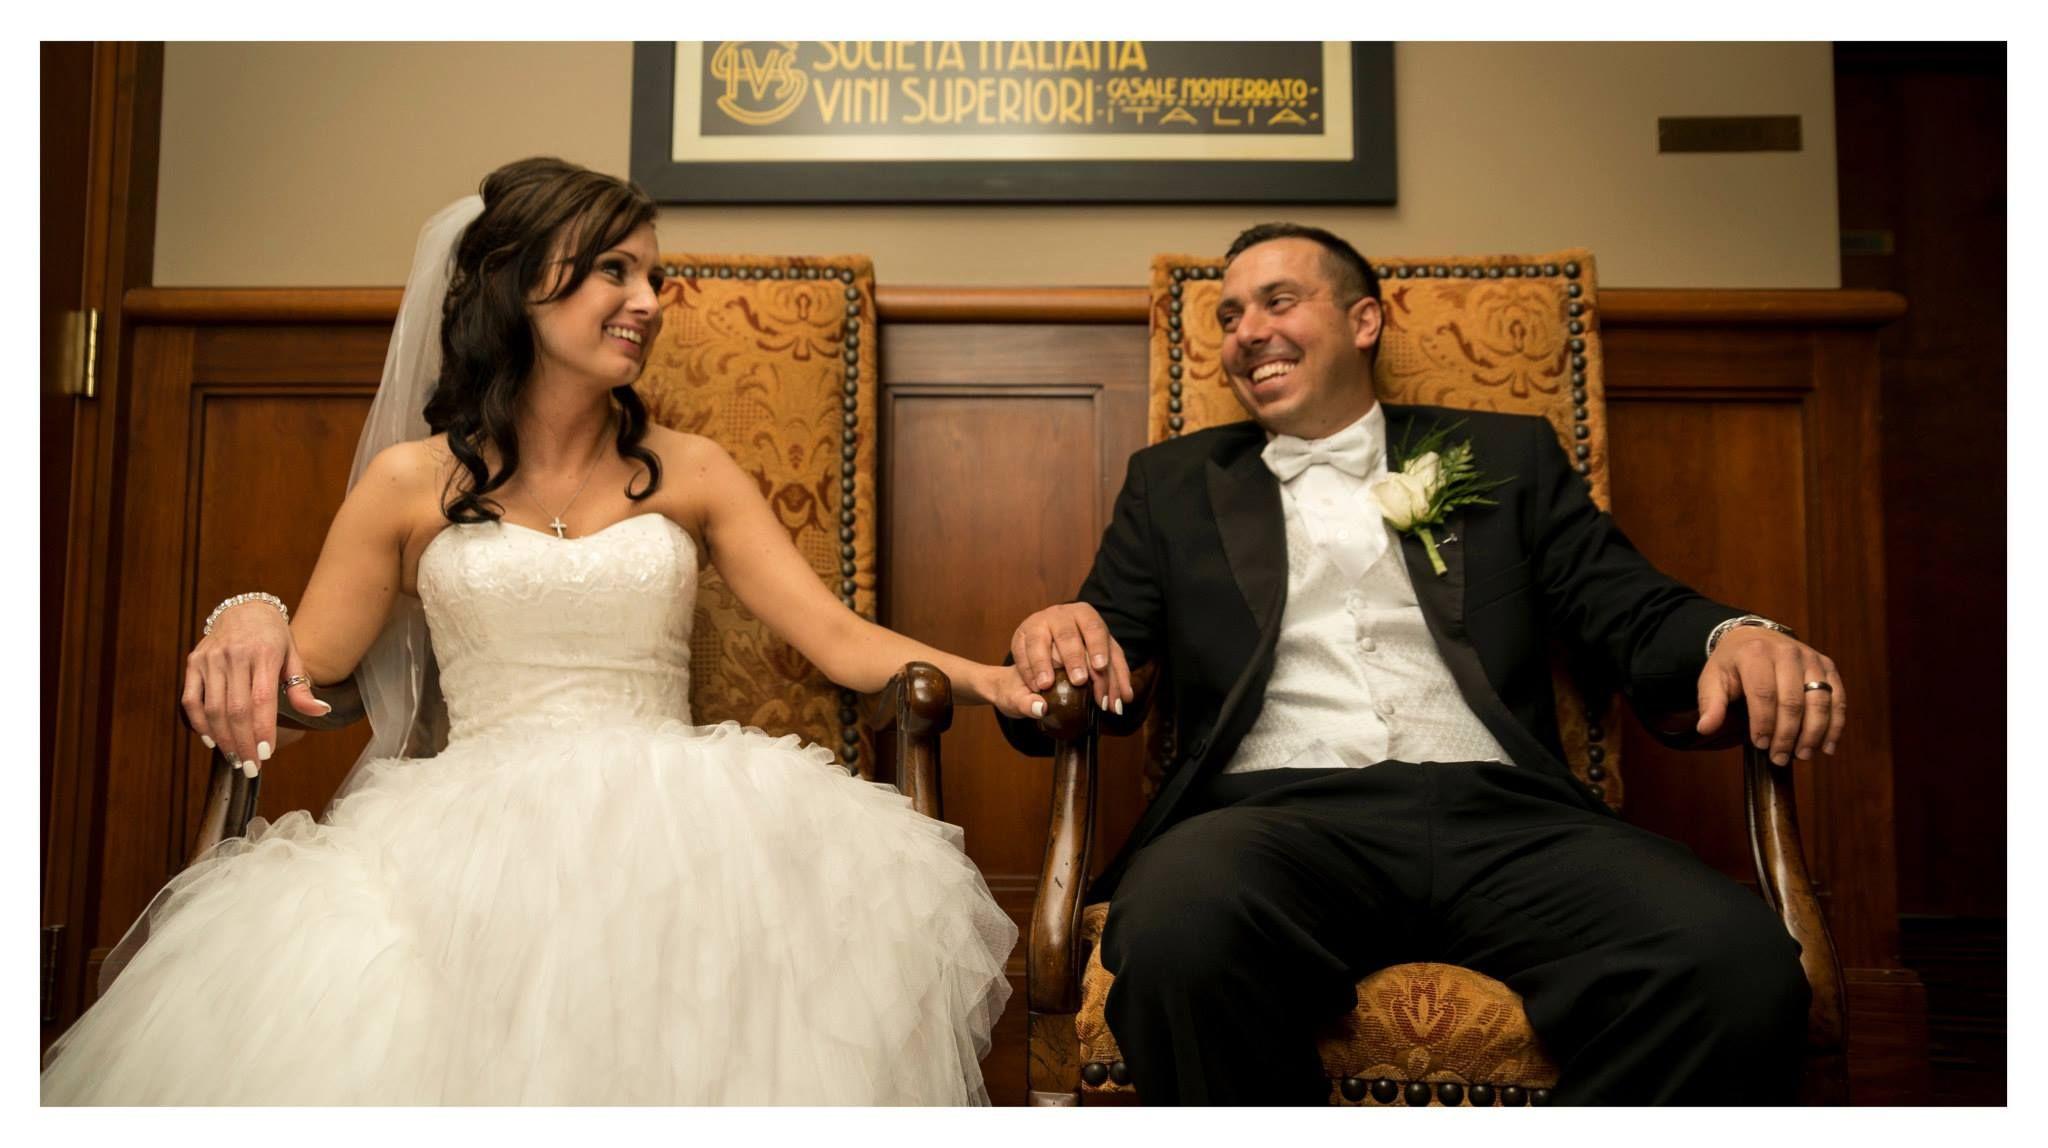 Wedding weddingphotography weddingdress weddinghair dream